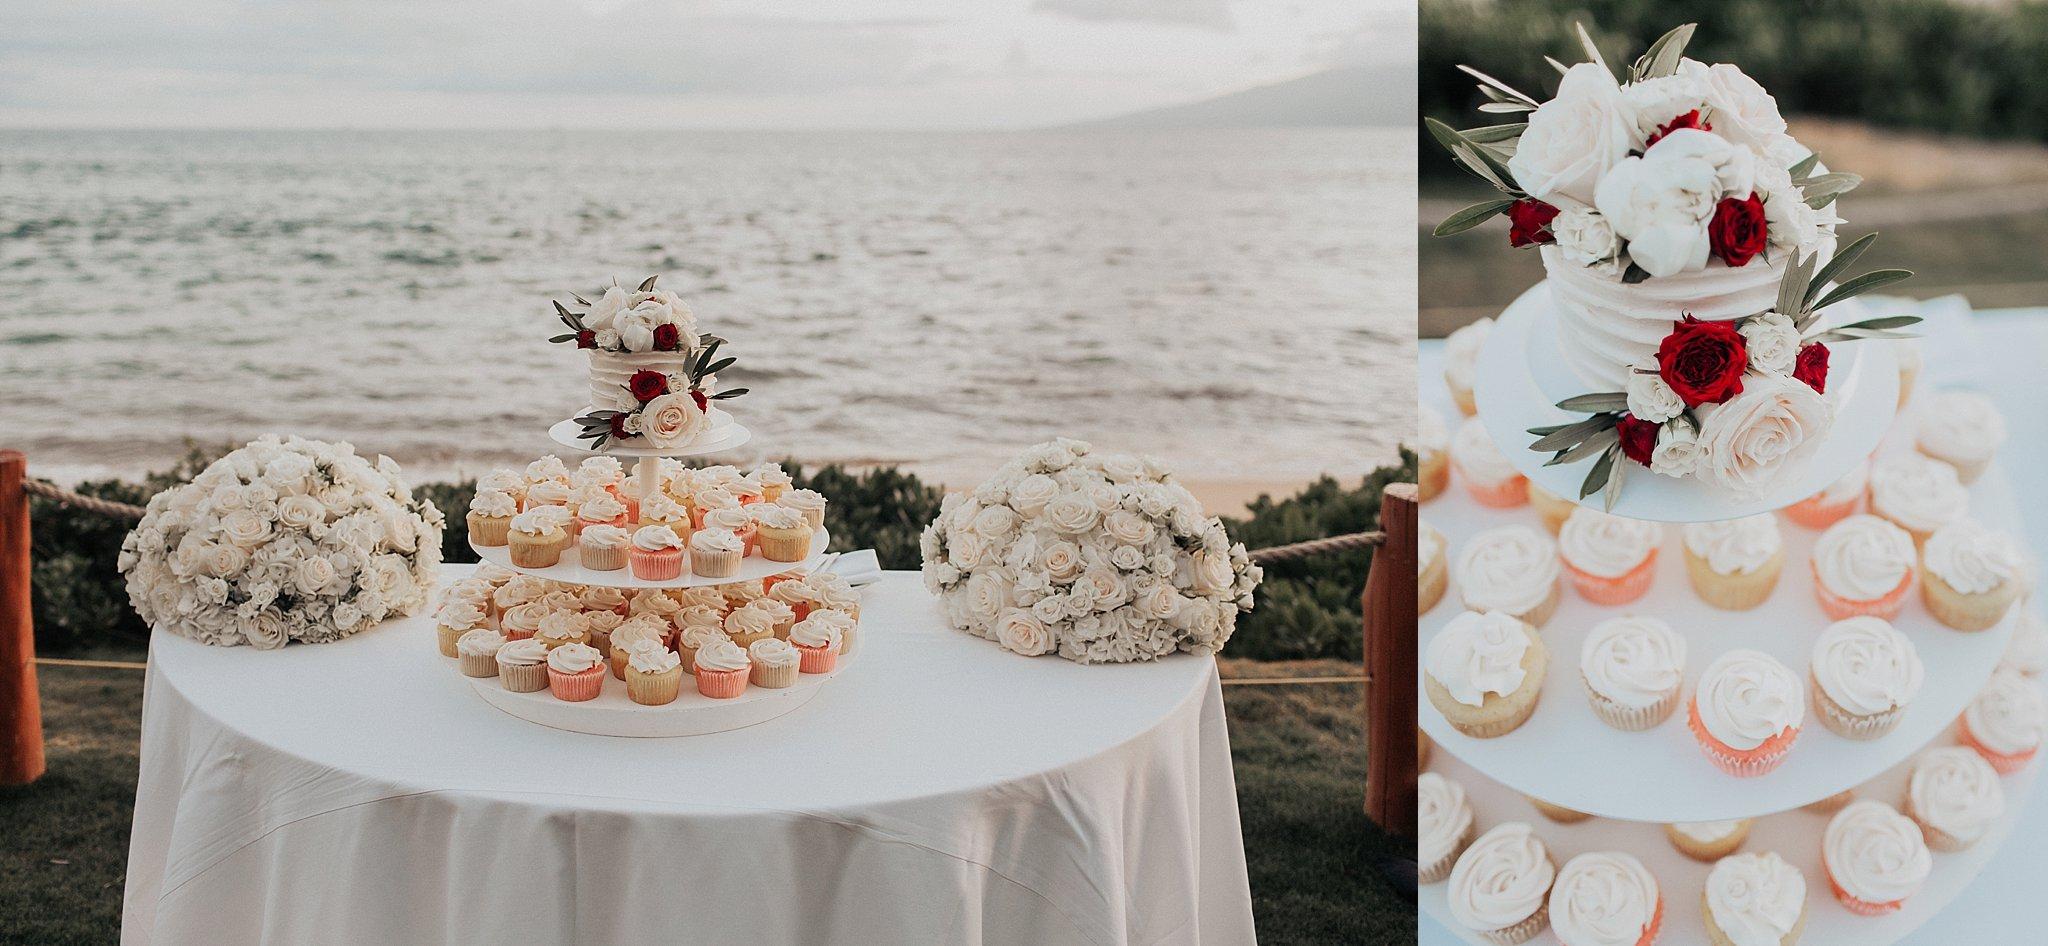 samantha_mcfarlen_bellingham_washington_engagement_photography_seattle_wedding_photographer_0260.jpg